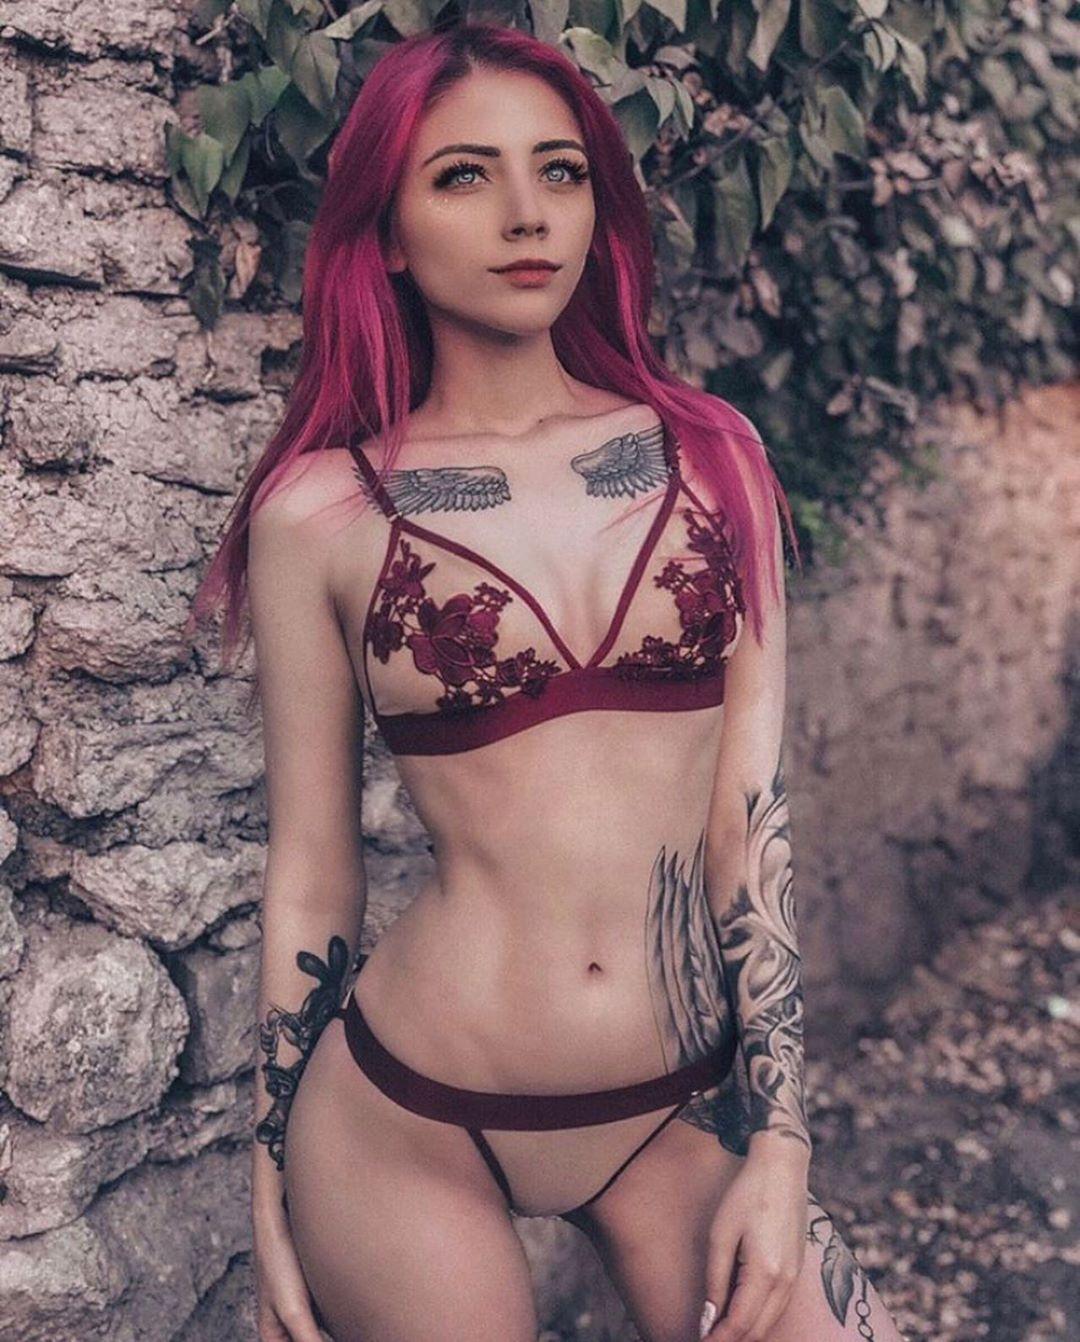 GAME OVER❤️ ❤️: @tattooworld4ever 👩🏻🦰: : @kira_braun2  #tattoos #tattoo #ink #inked #tattooed #tattooartist #art #tattooart #tattoolife #tattooing #tattooist #artist #tattoovideo #girlswithtattoos #tattooer #blackwork #inkedup #blackandgreytattoo #inkedgirls #tattooideas #tattooedgirls #tattoostyle #the_art_of_tattoo #more_than_ink #tattoodesign #blackandgrey #instagood #tattooink #tattooworld4ever